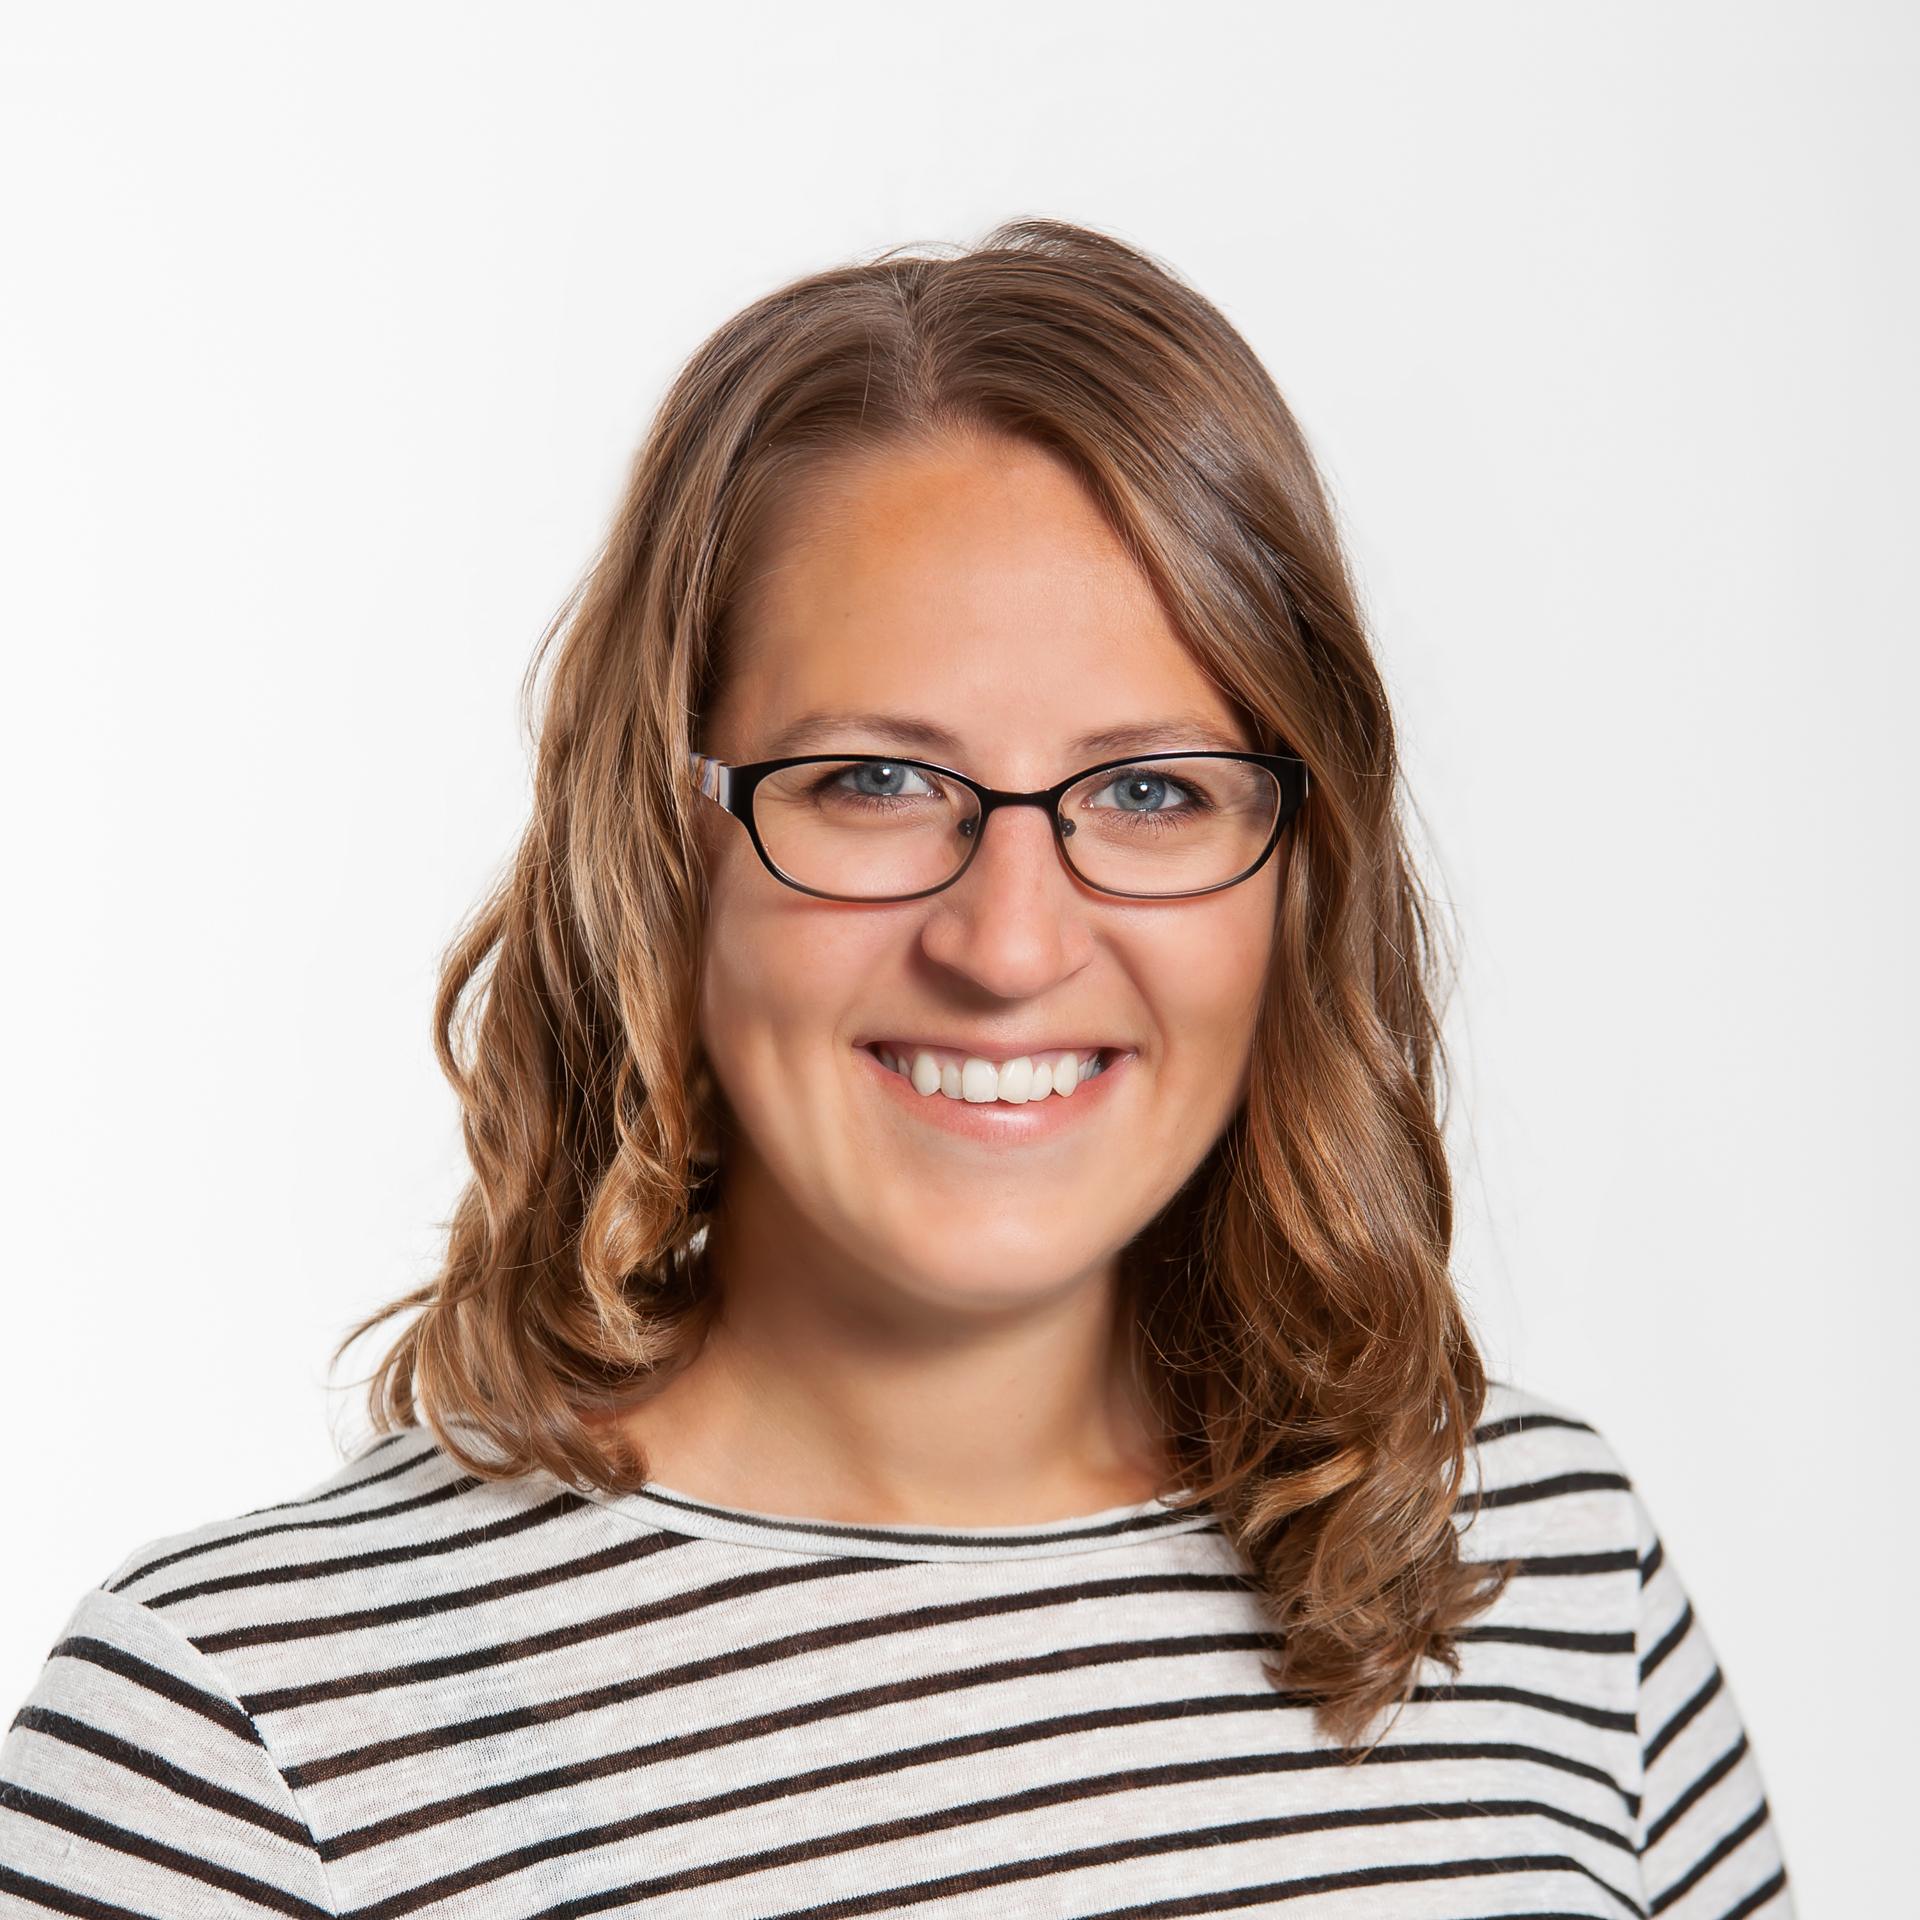 Renee Ratliff Digital Marketing and Communications Professional